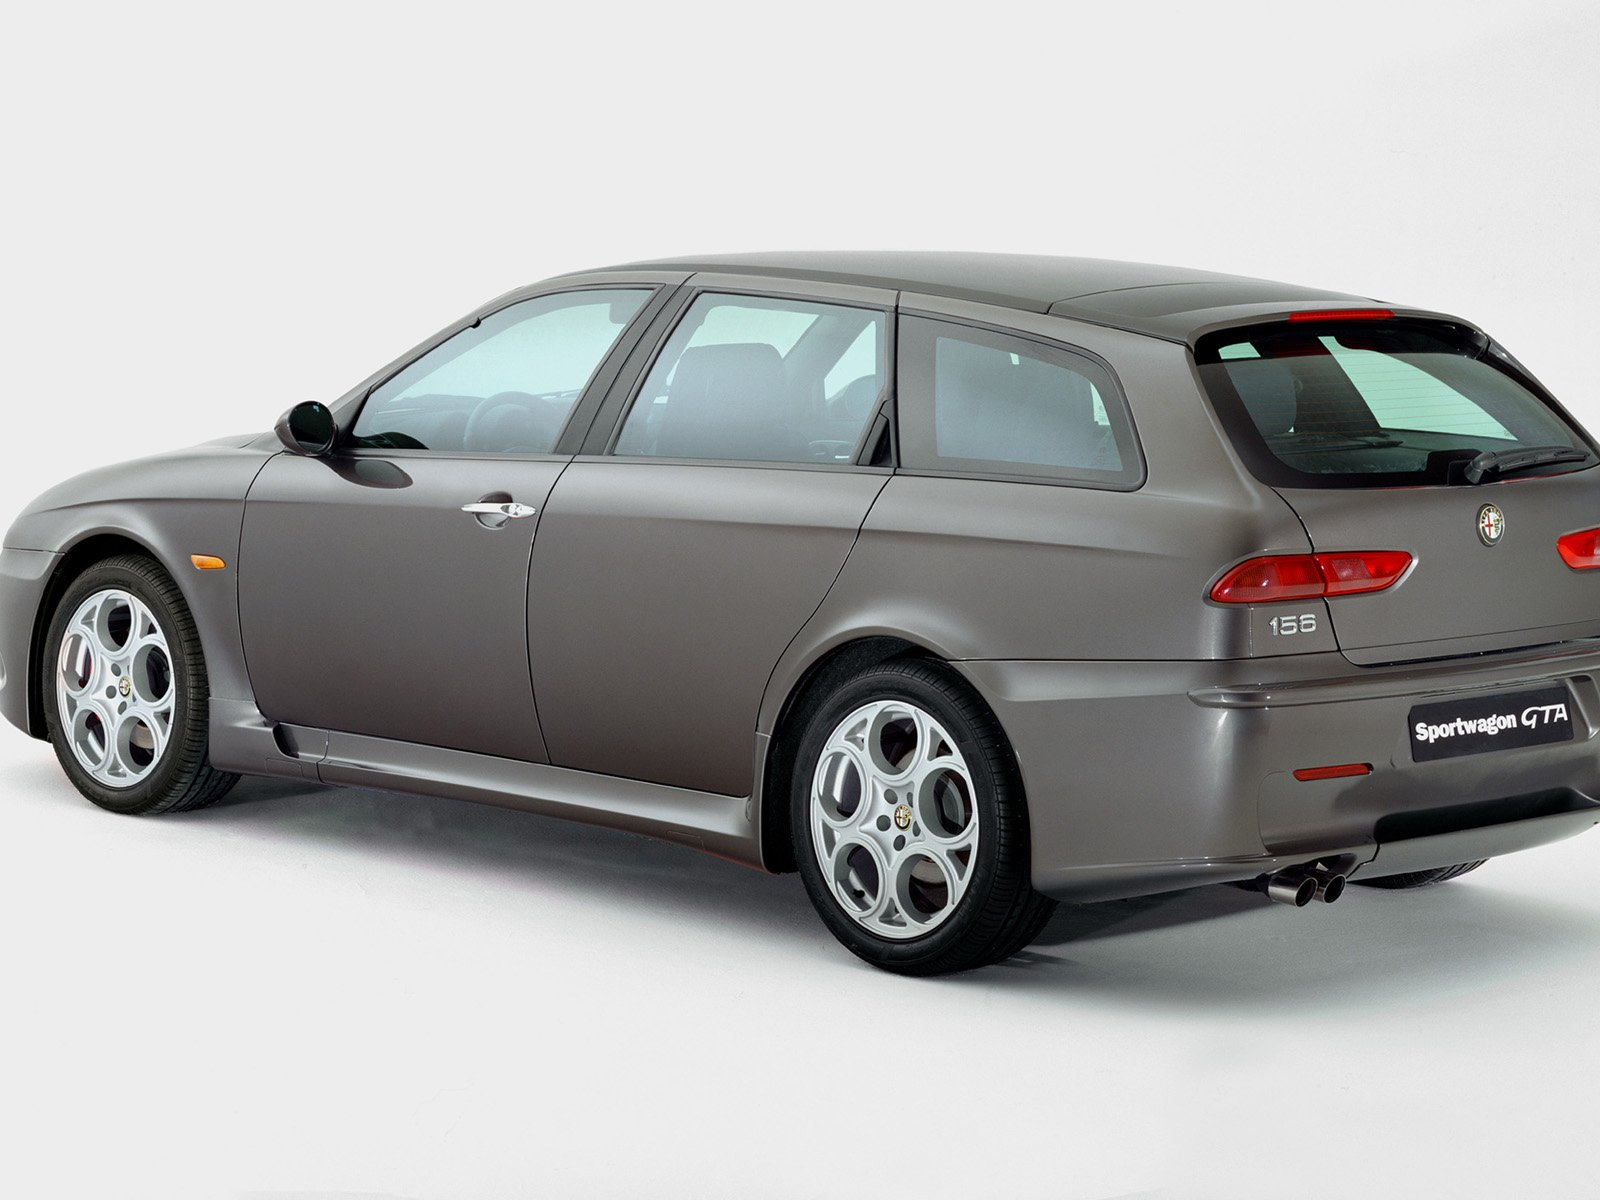 alfa romeo 156 gta sport wagon 3 2 i v6 24v 250 hp. Black Bedroom Furniture Sets. Home Design Ideas